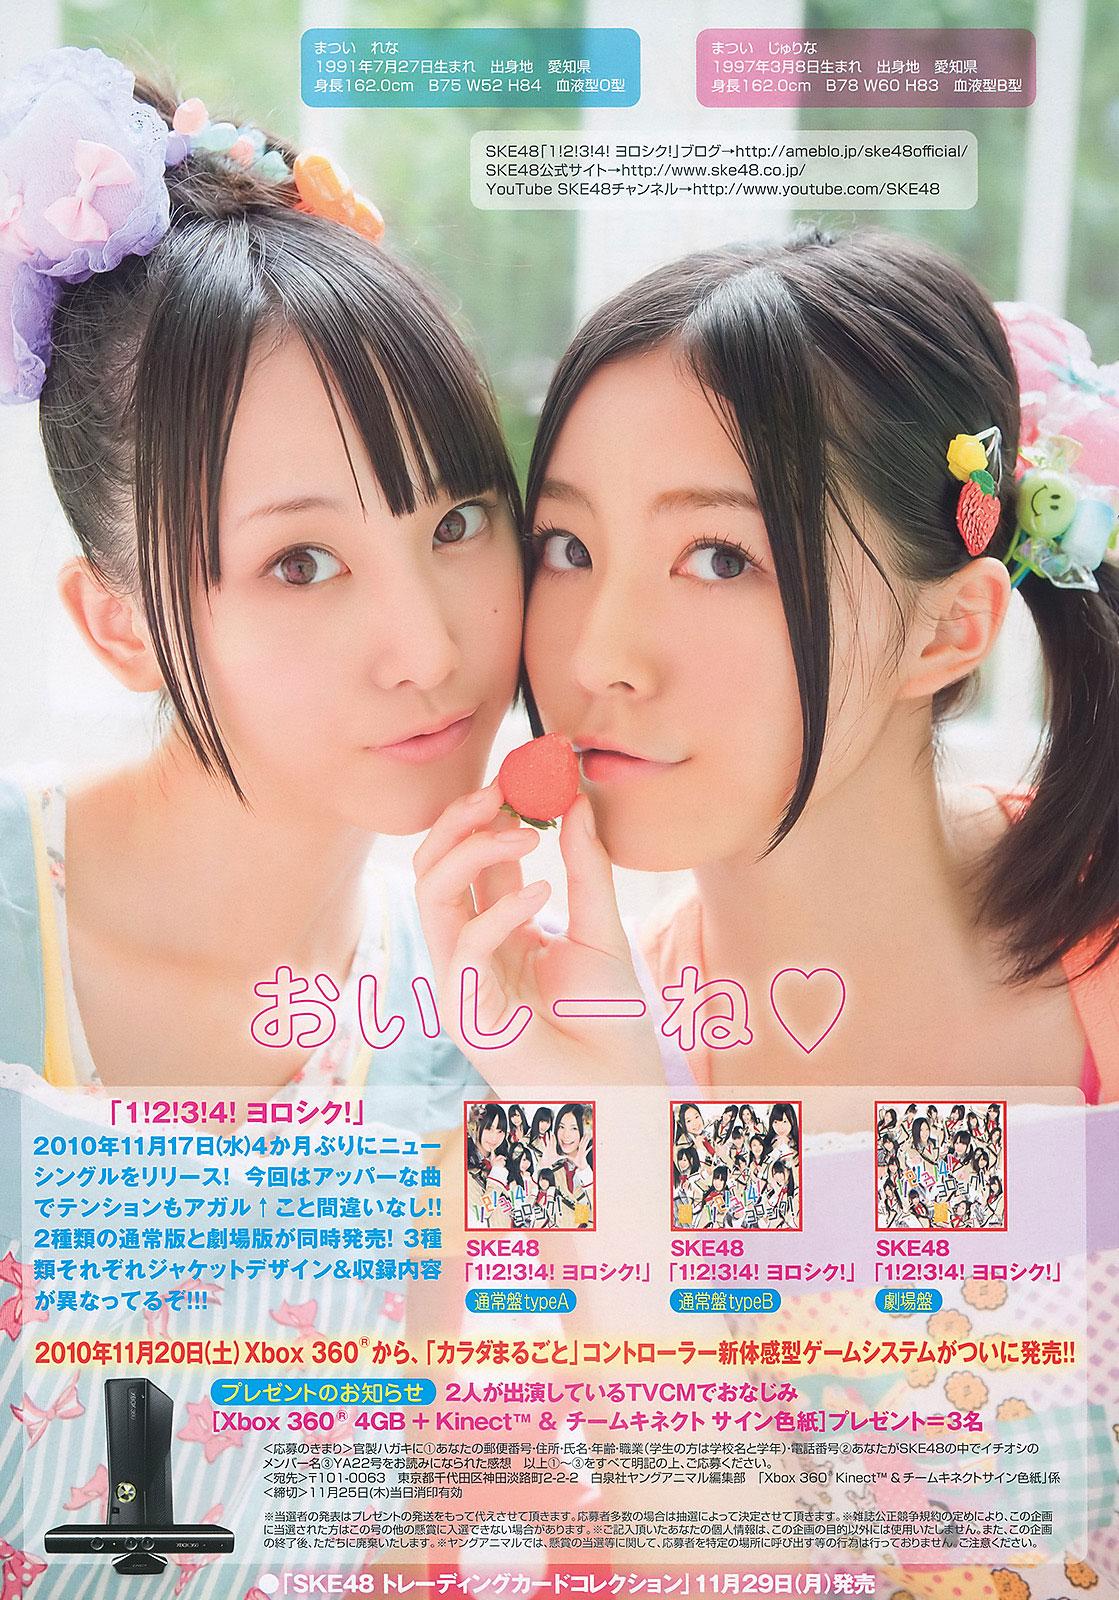 SKE48 Jurina and Rena Matsui Young Animal magazine